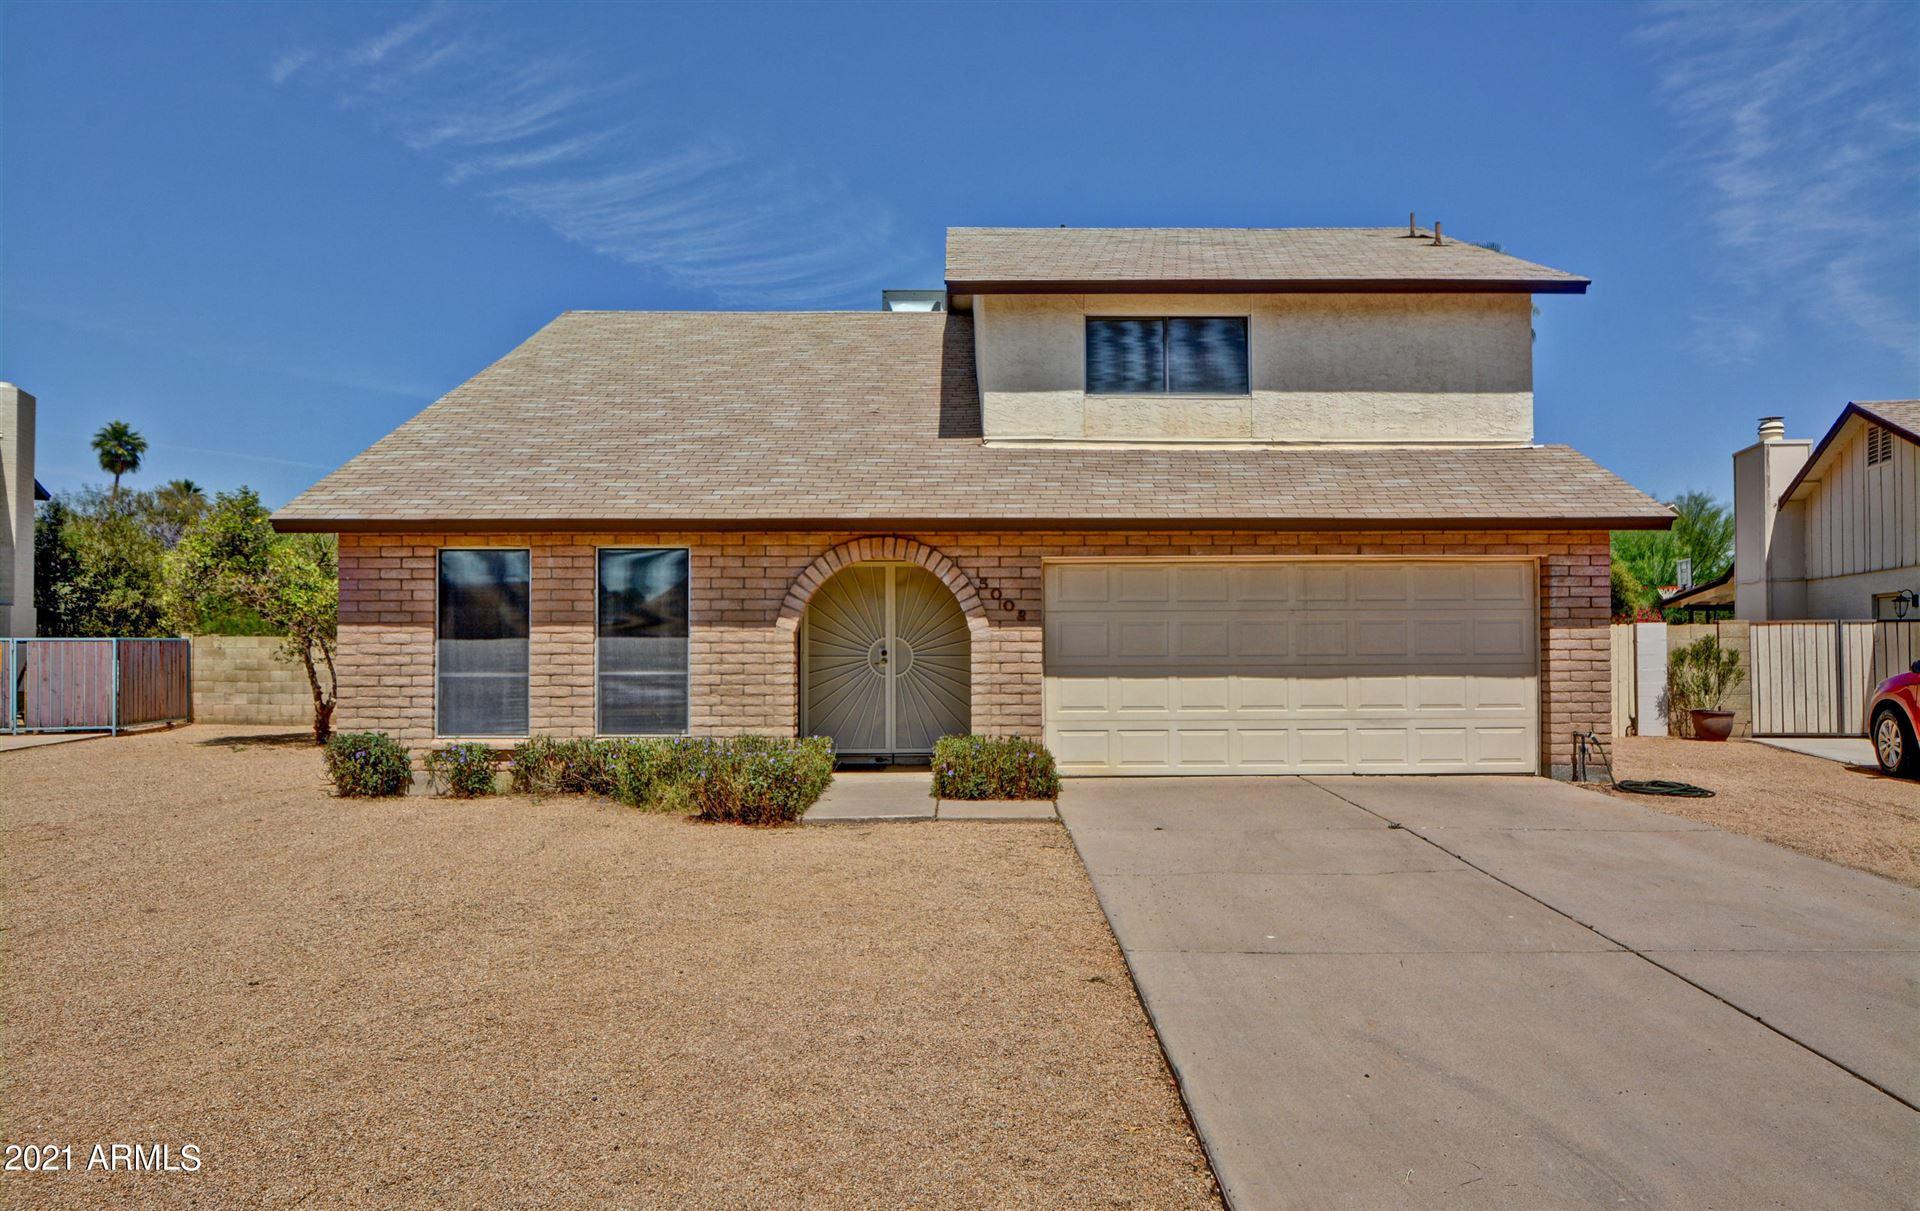 Photo of 5008 W AUGUSTA Circle, Glendale, AZ 85308 (MLS # 6232554)